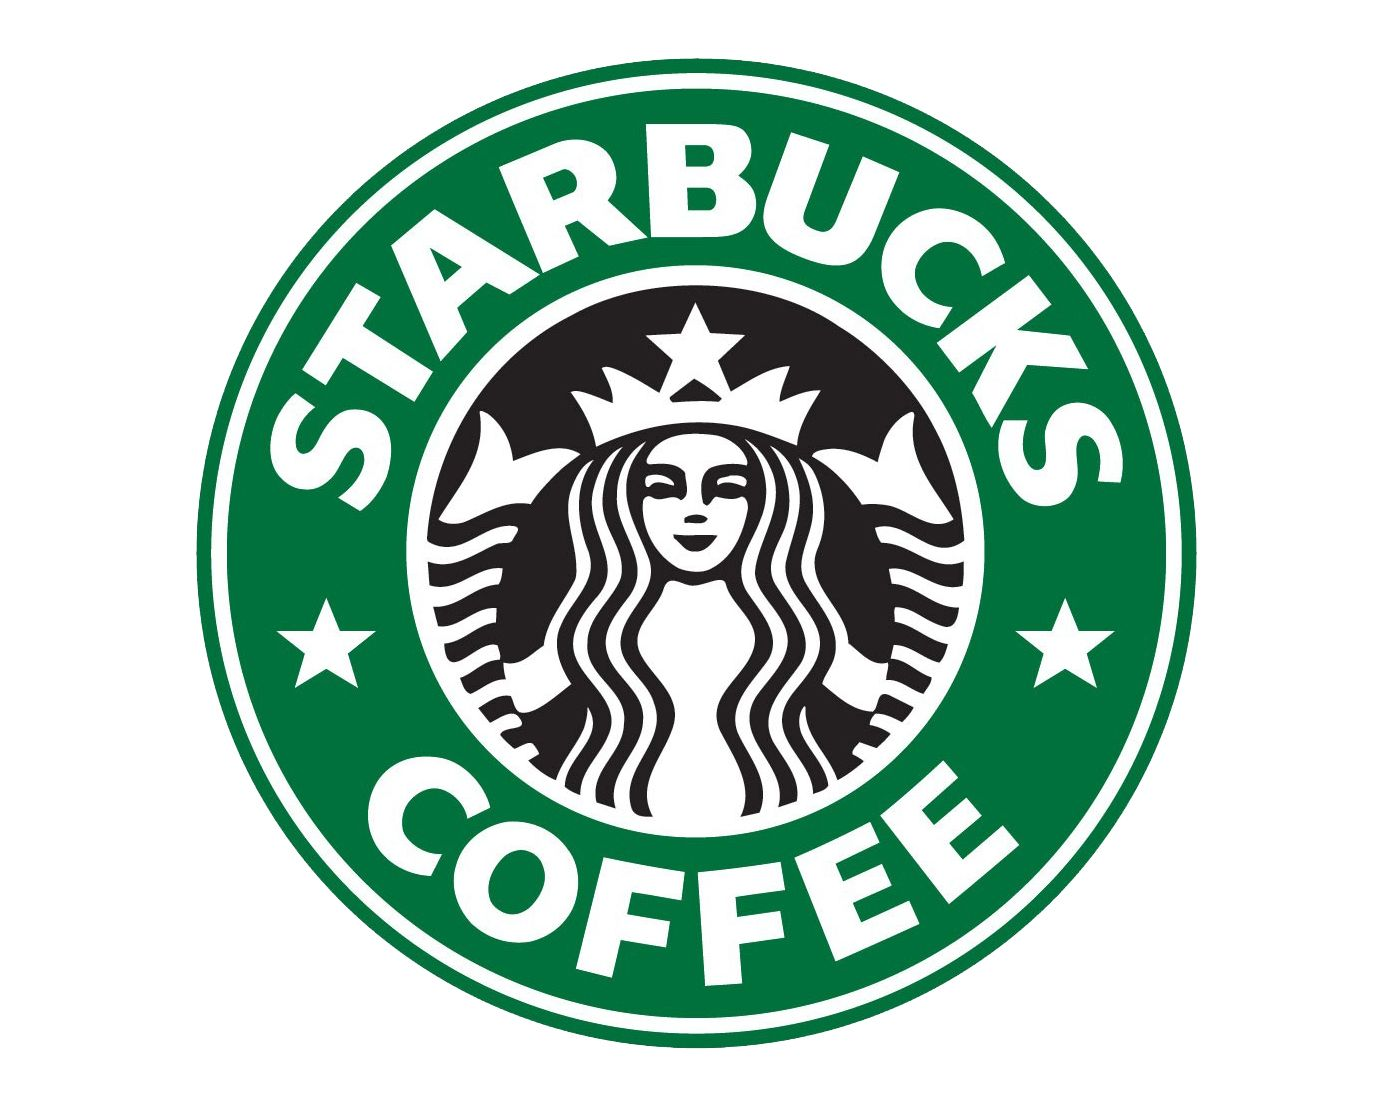 starbucks logo meaning スタバ ロゴ, スターバックスのロゴ, スタバ